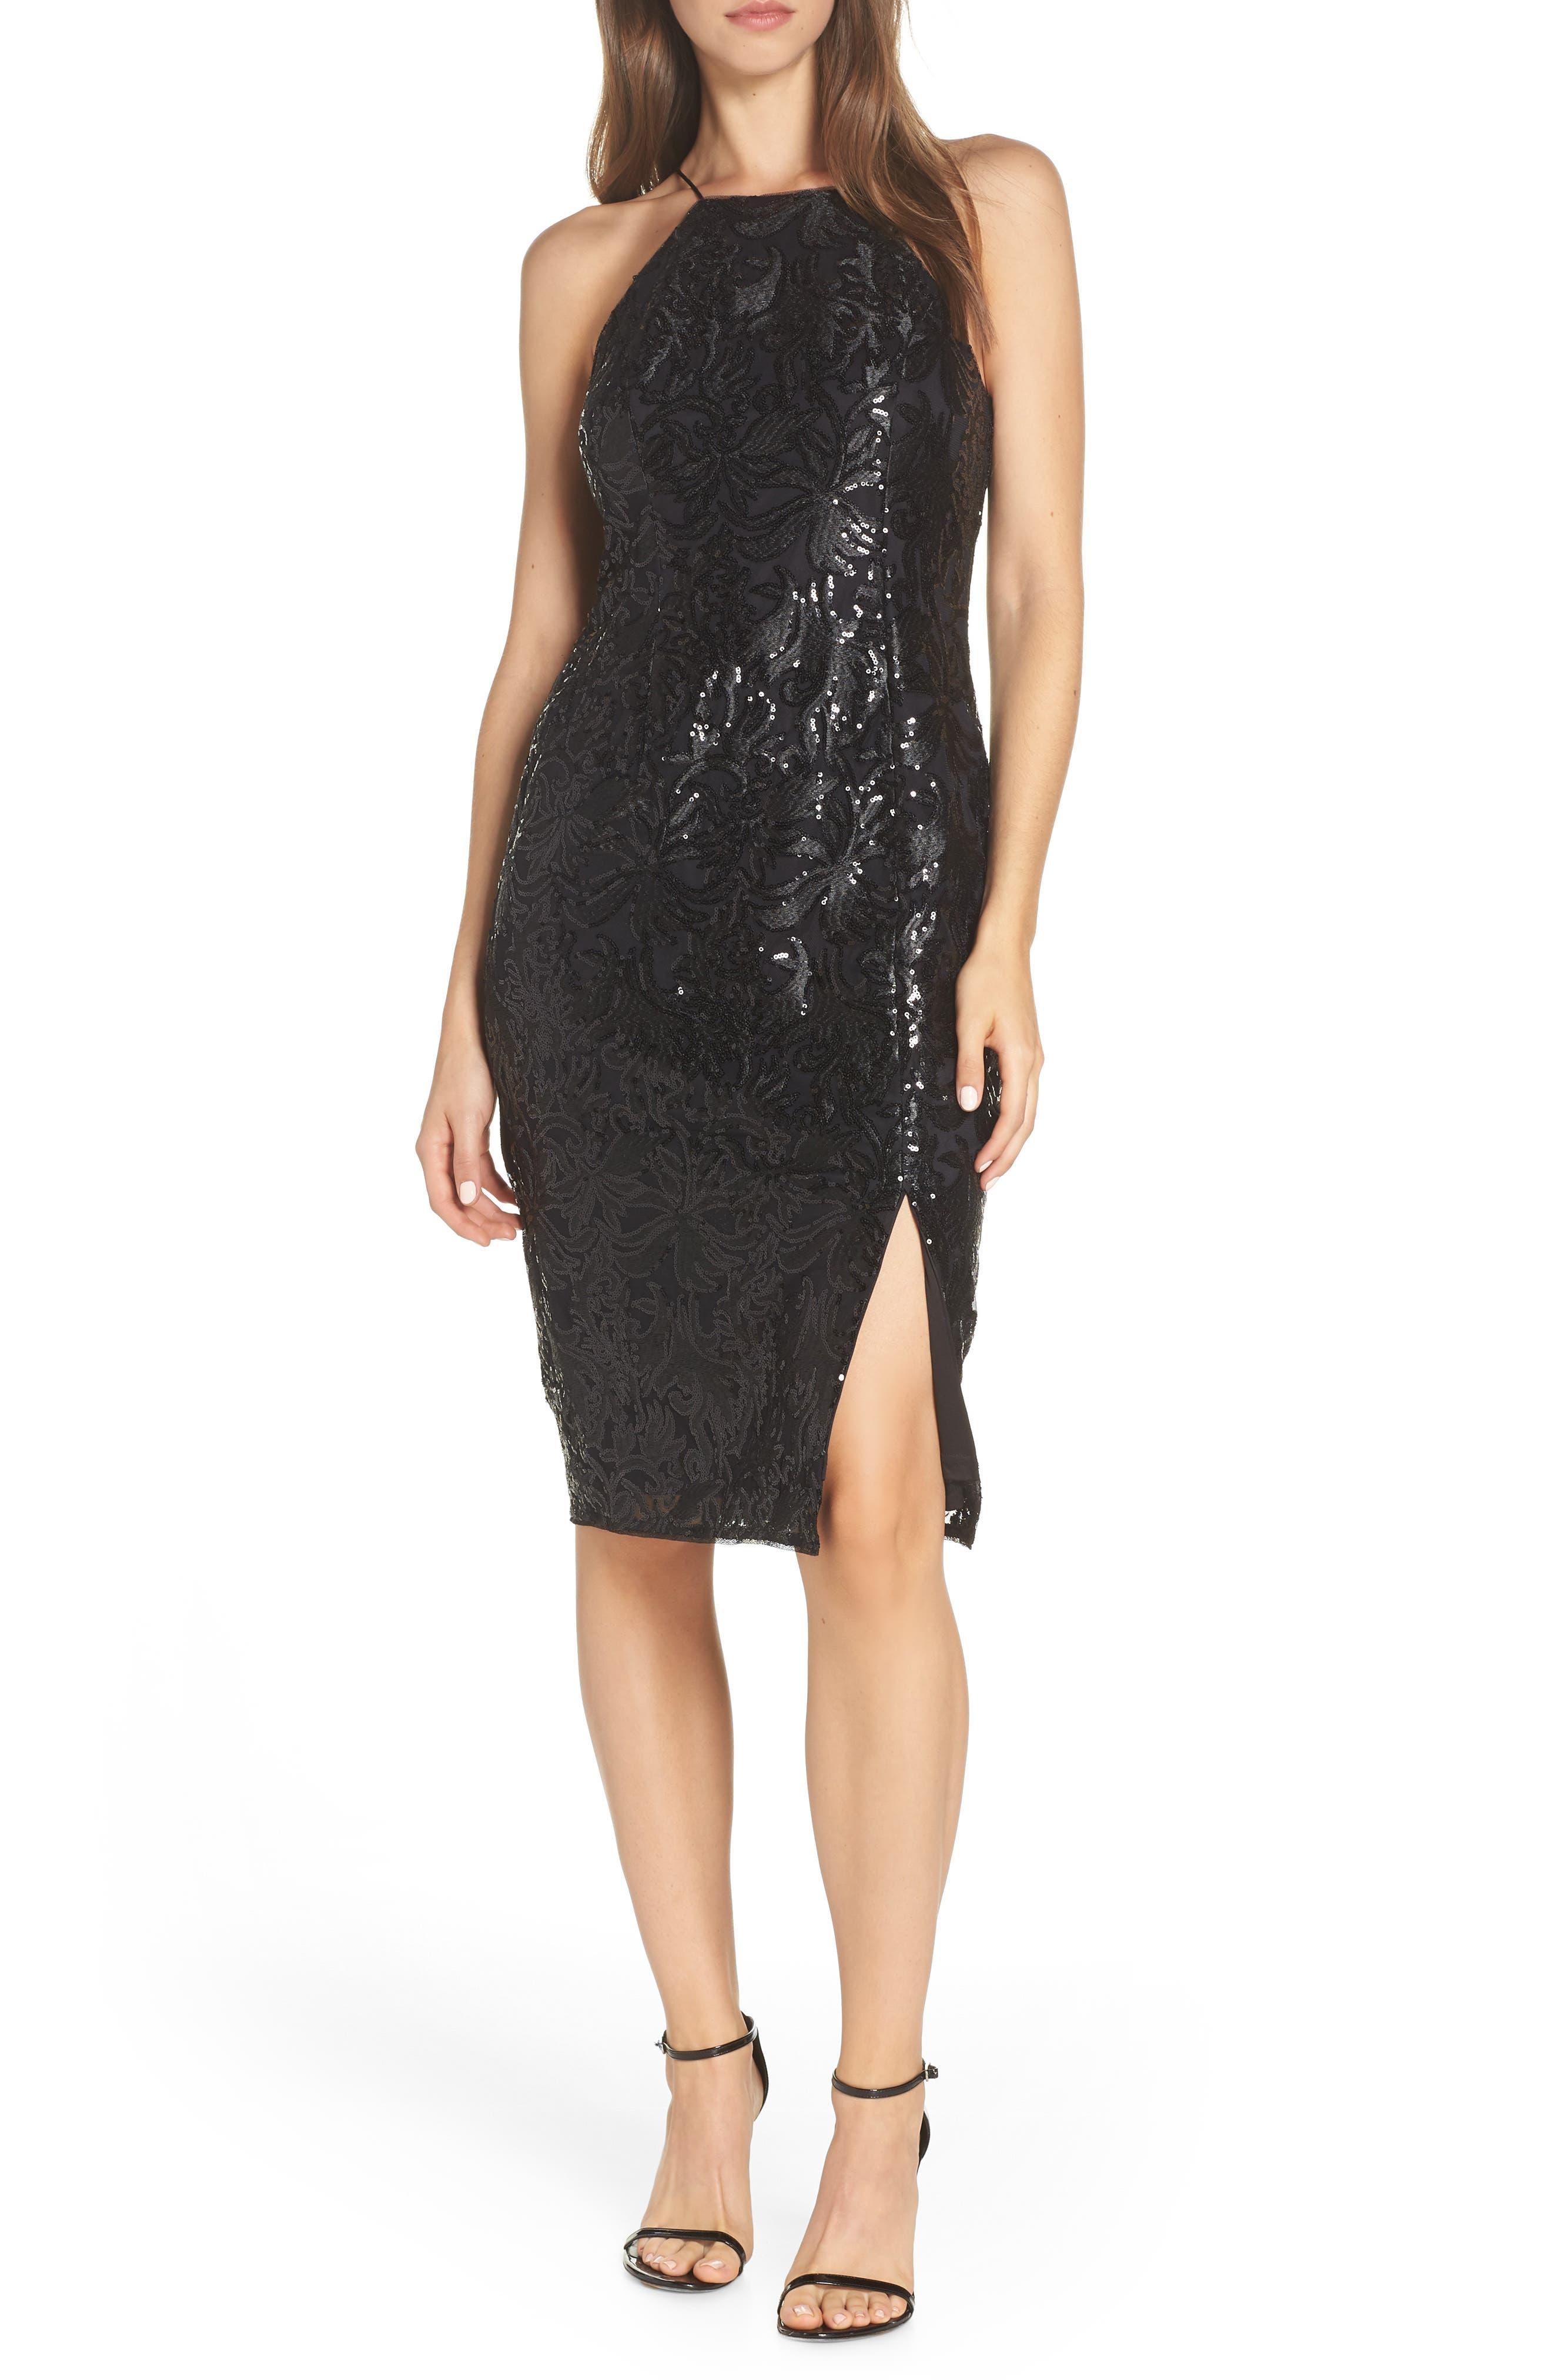 Adrianna Papell Halter Neck Sequin Cocktail Dress, Black